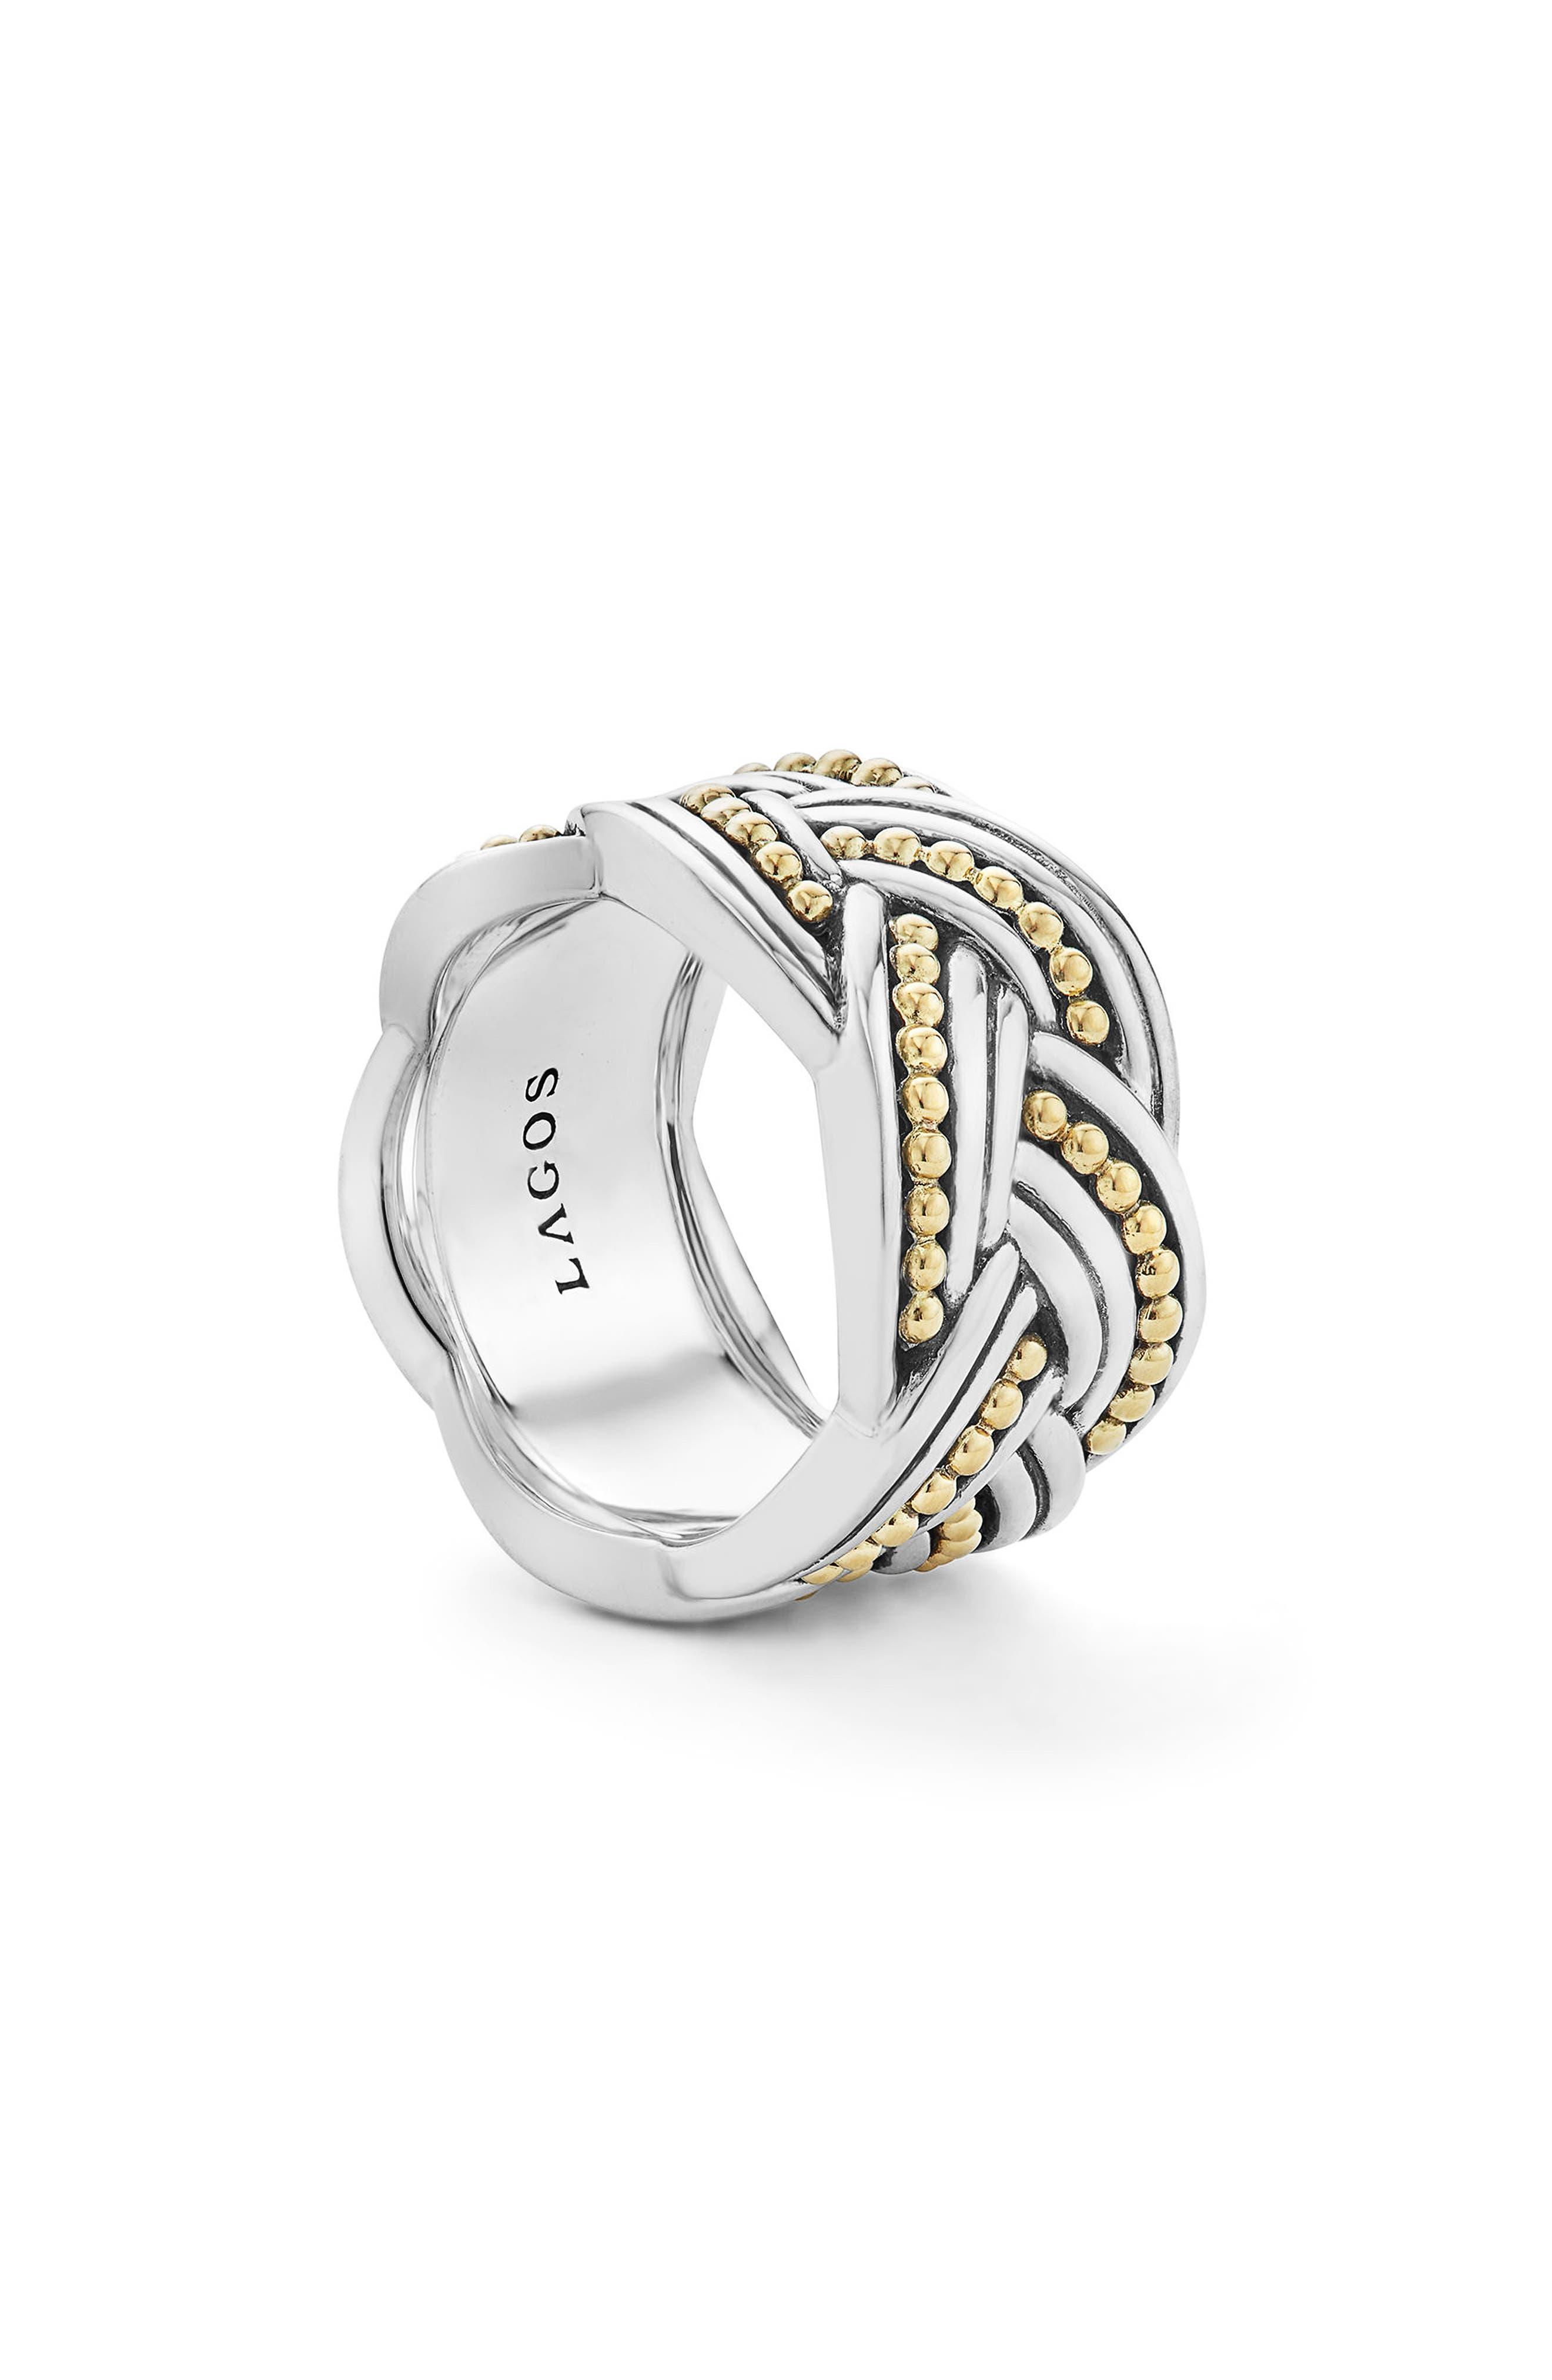 Torsade Knot Ring,                             Alternate thumbnail 5, color,                             Silver/ Gold